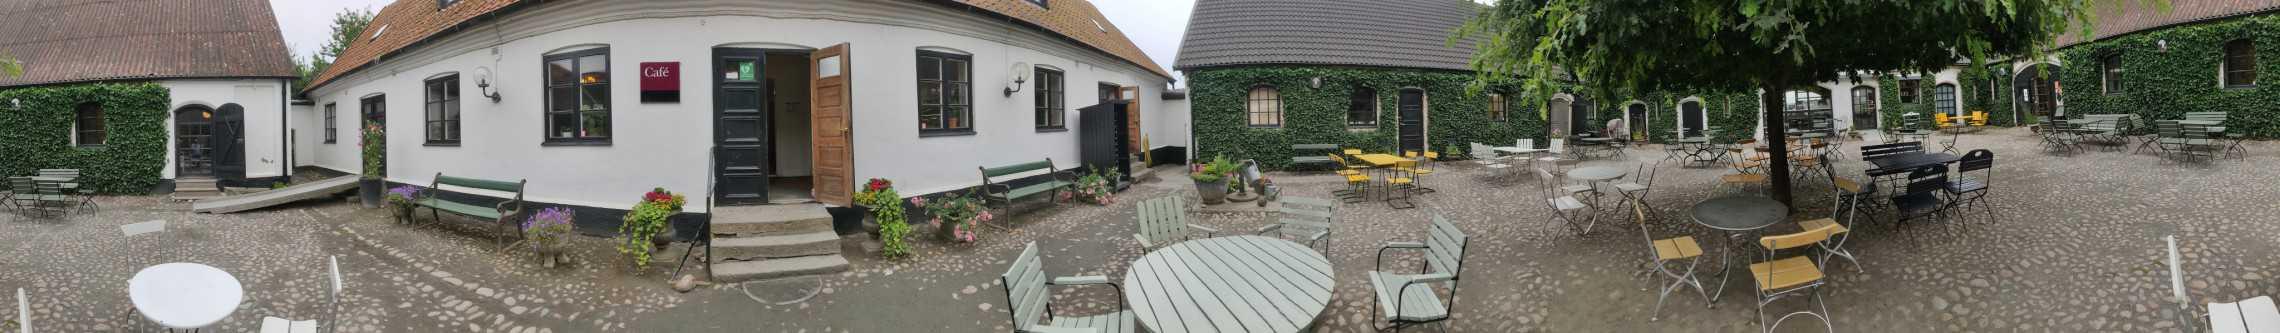 Matresa i södra Sverige 26